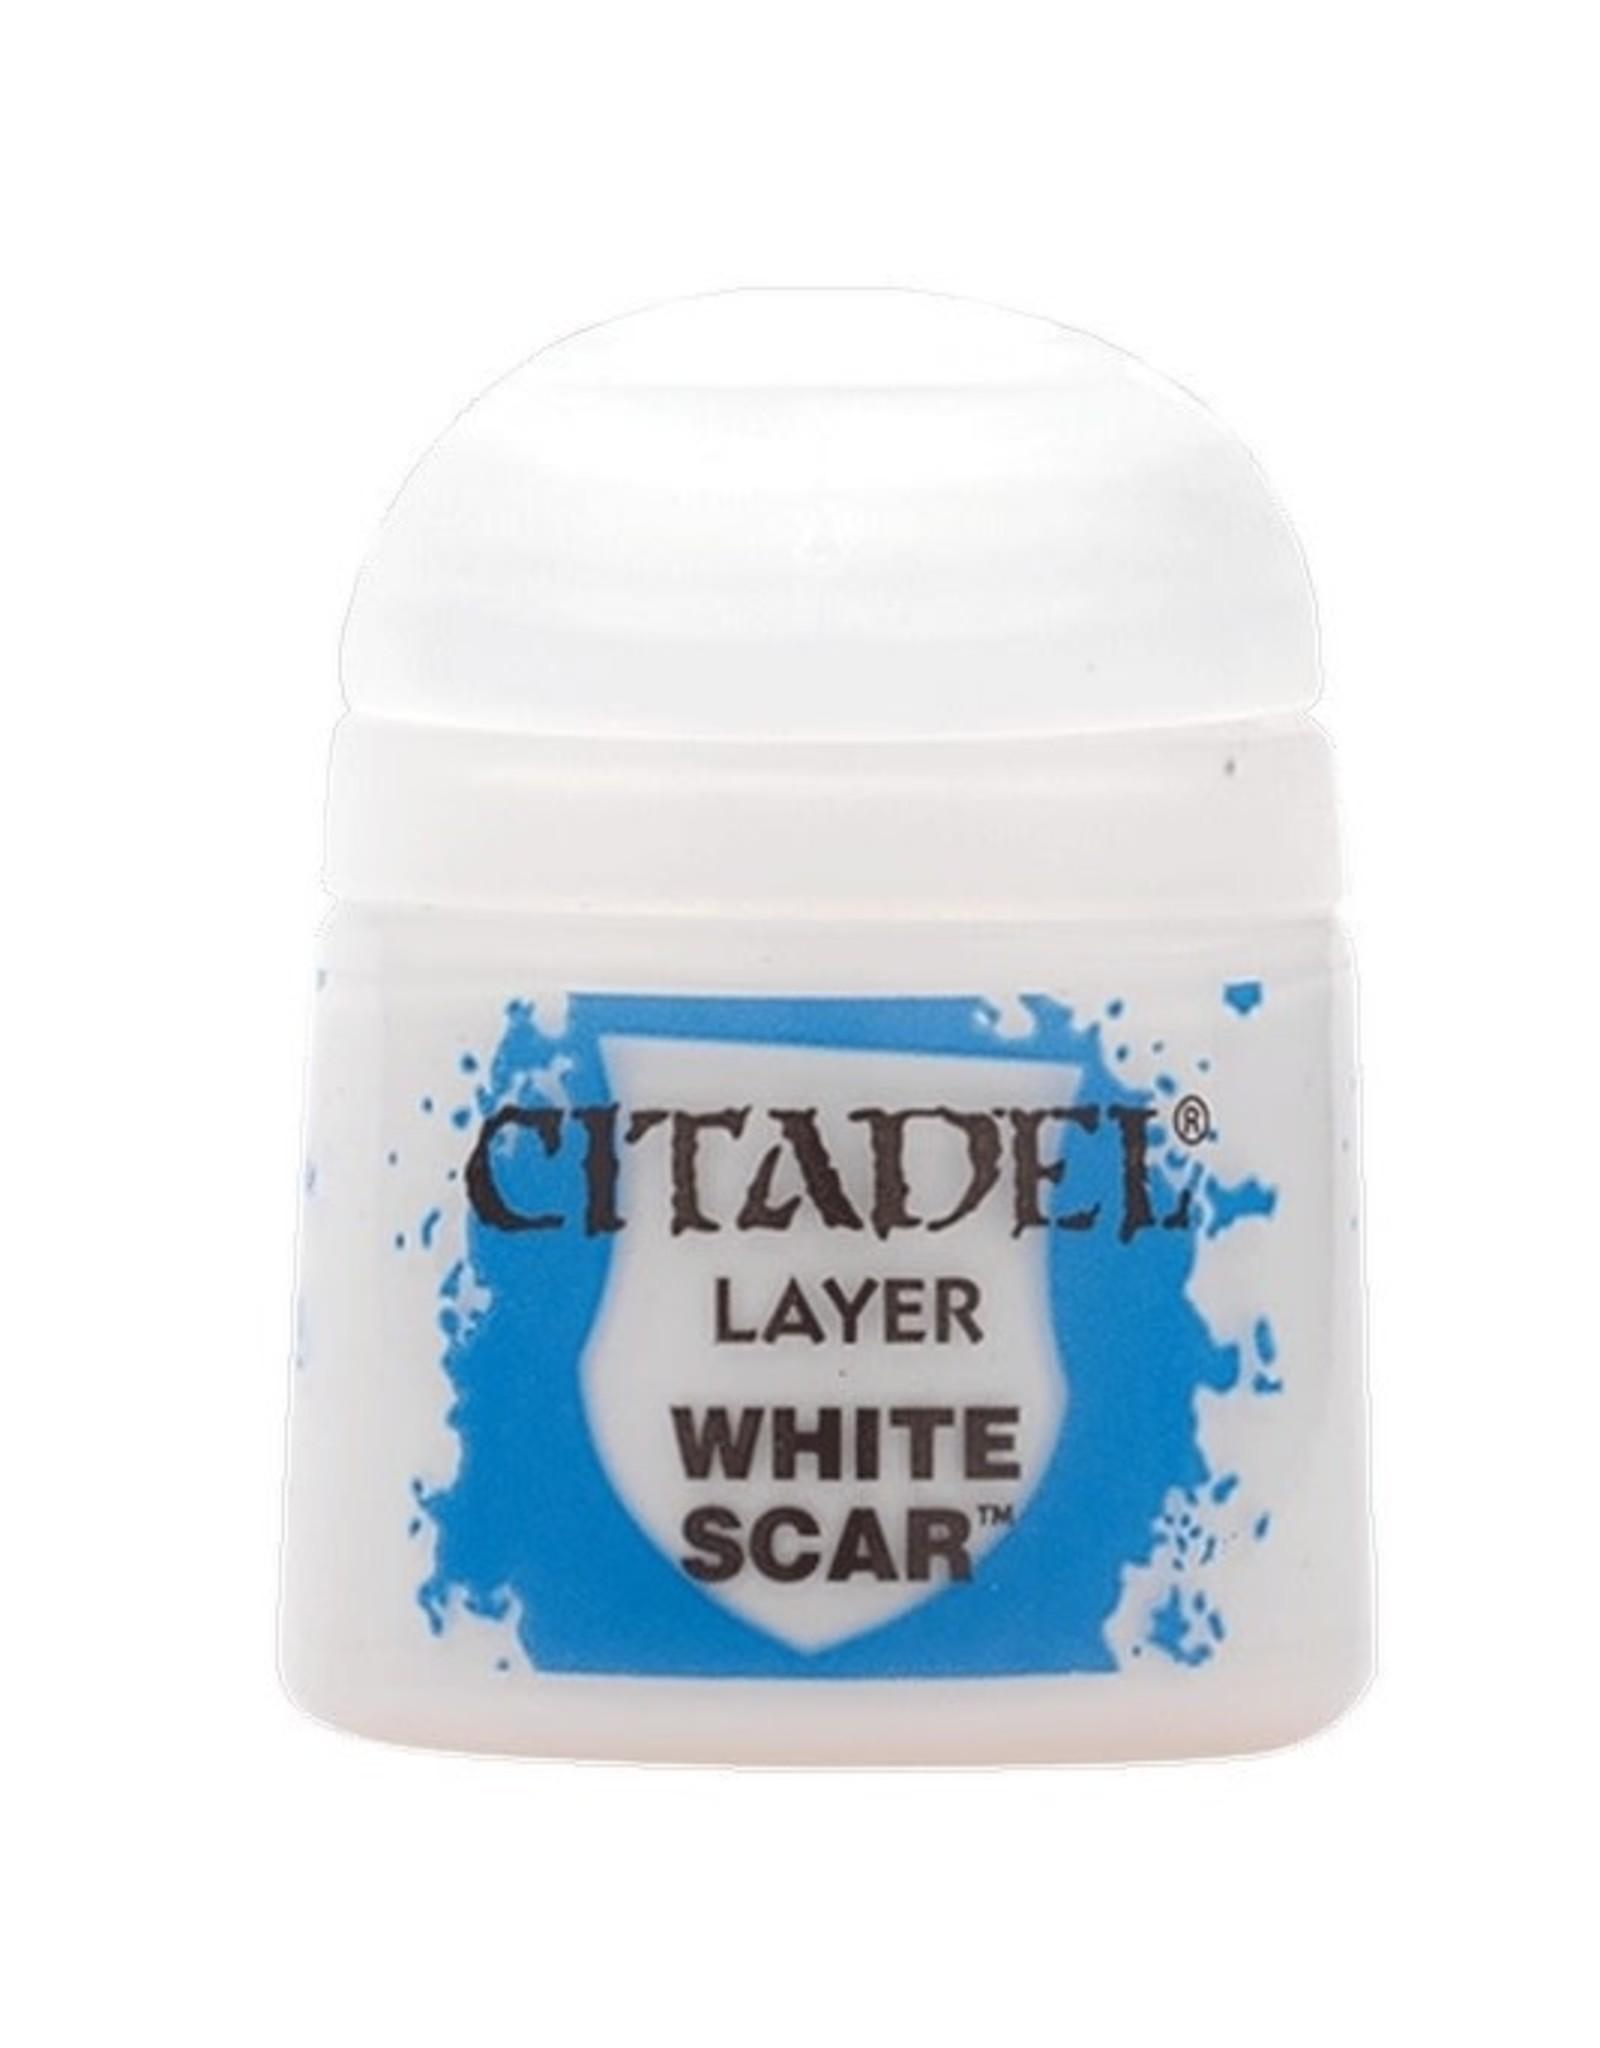 GAMES WORKSHOP CITADEL PAINT LAYER WHITE SCAR